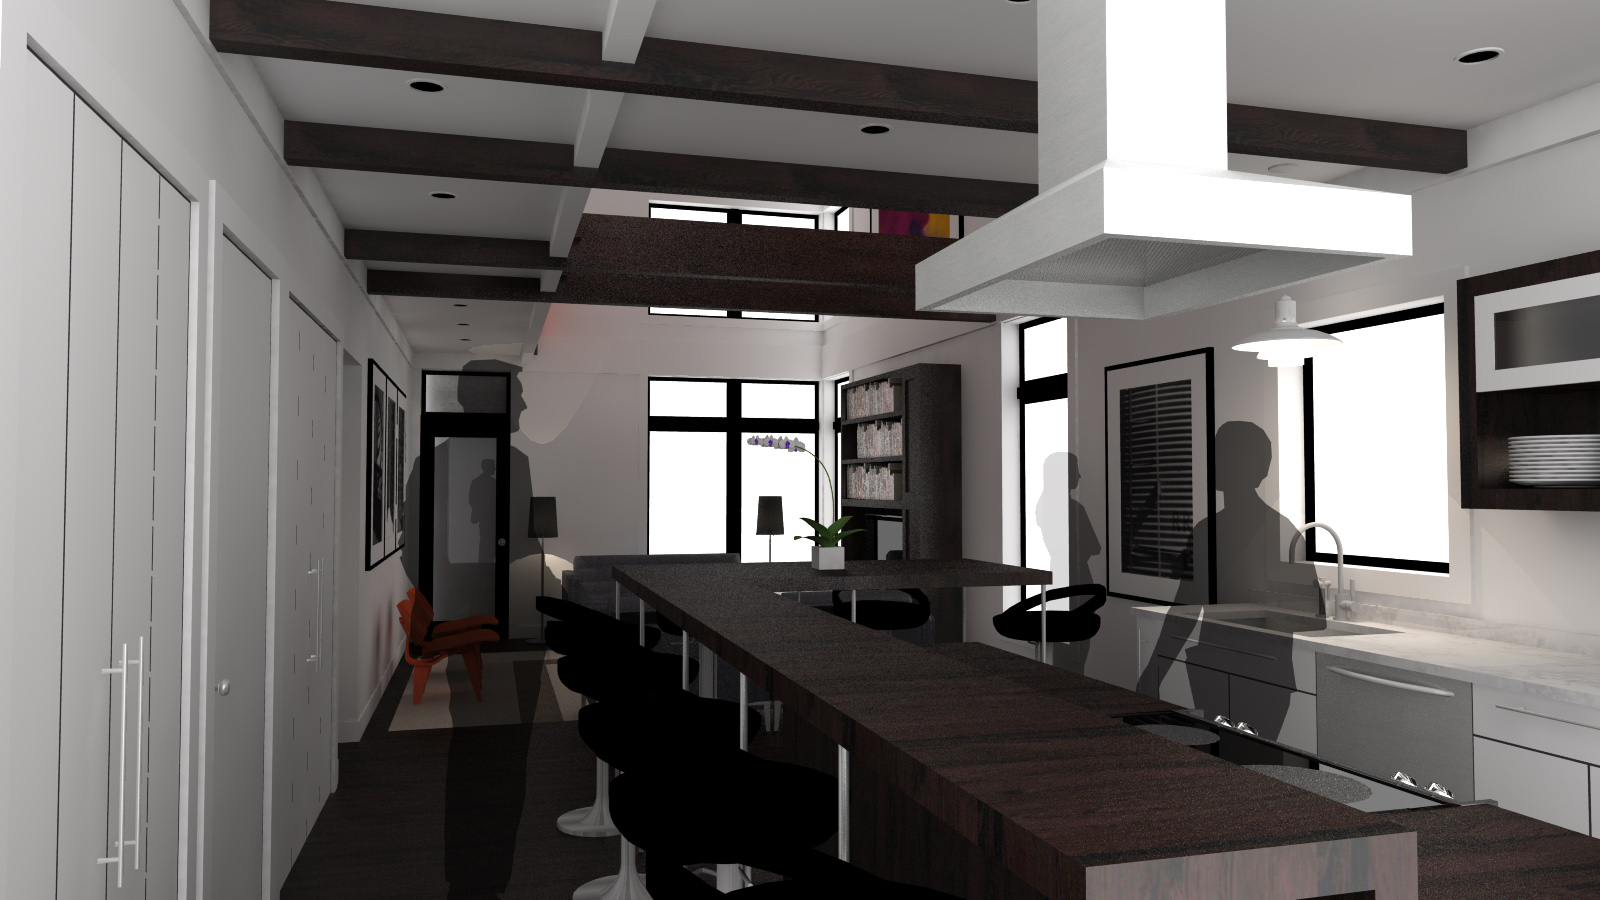 6_interiorview_1.jpg